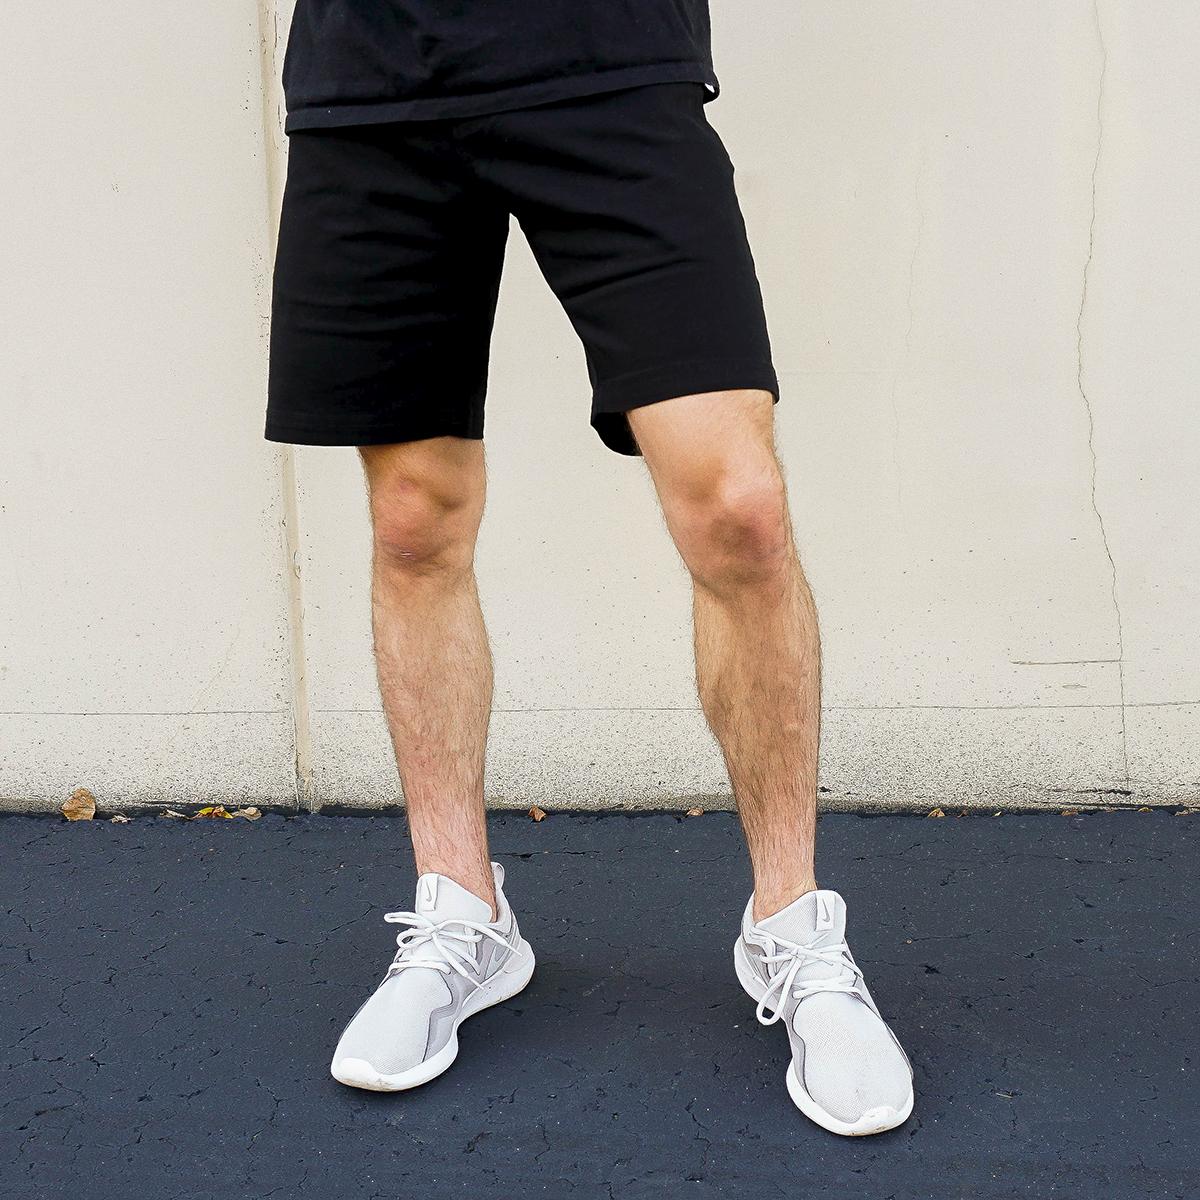 IZOD Men's Twill Flat Shorts